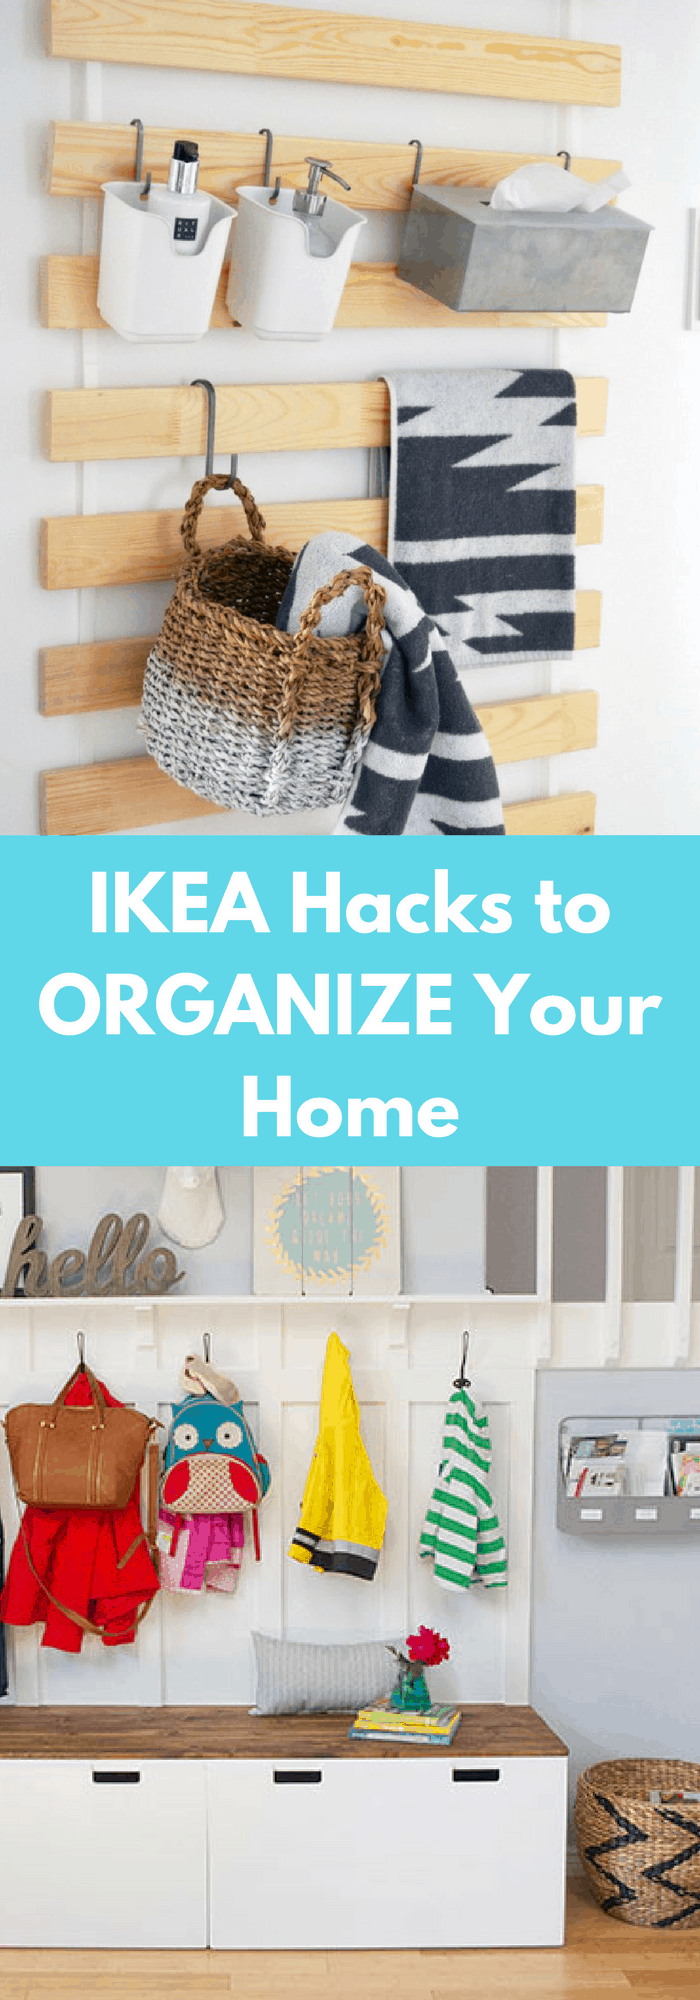 ikea hacks to organize your home